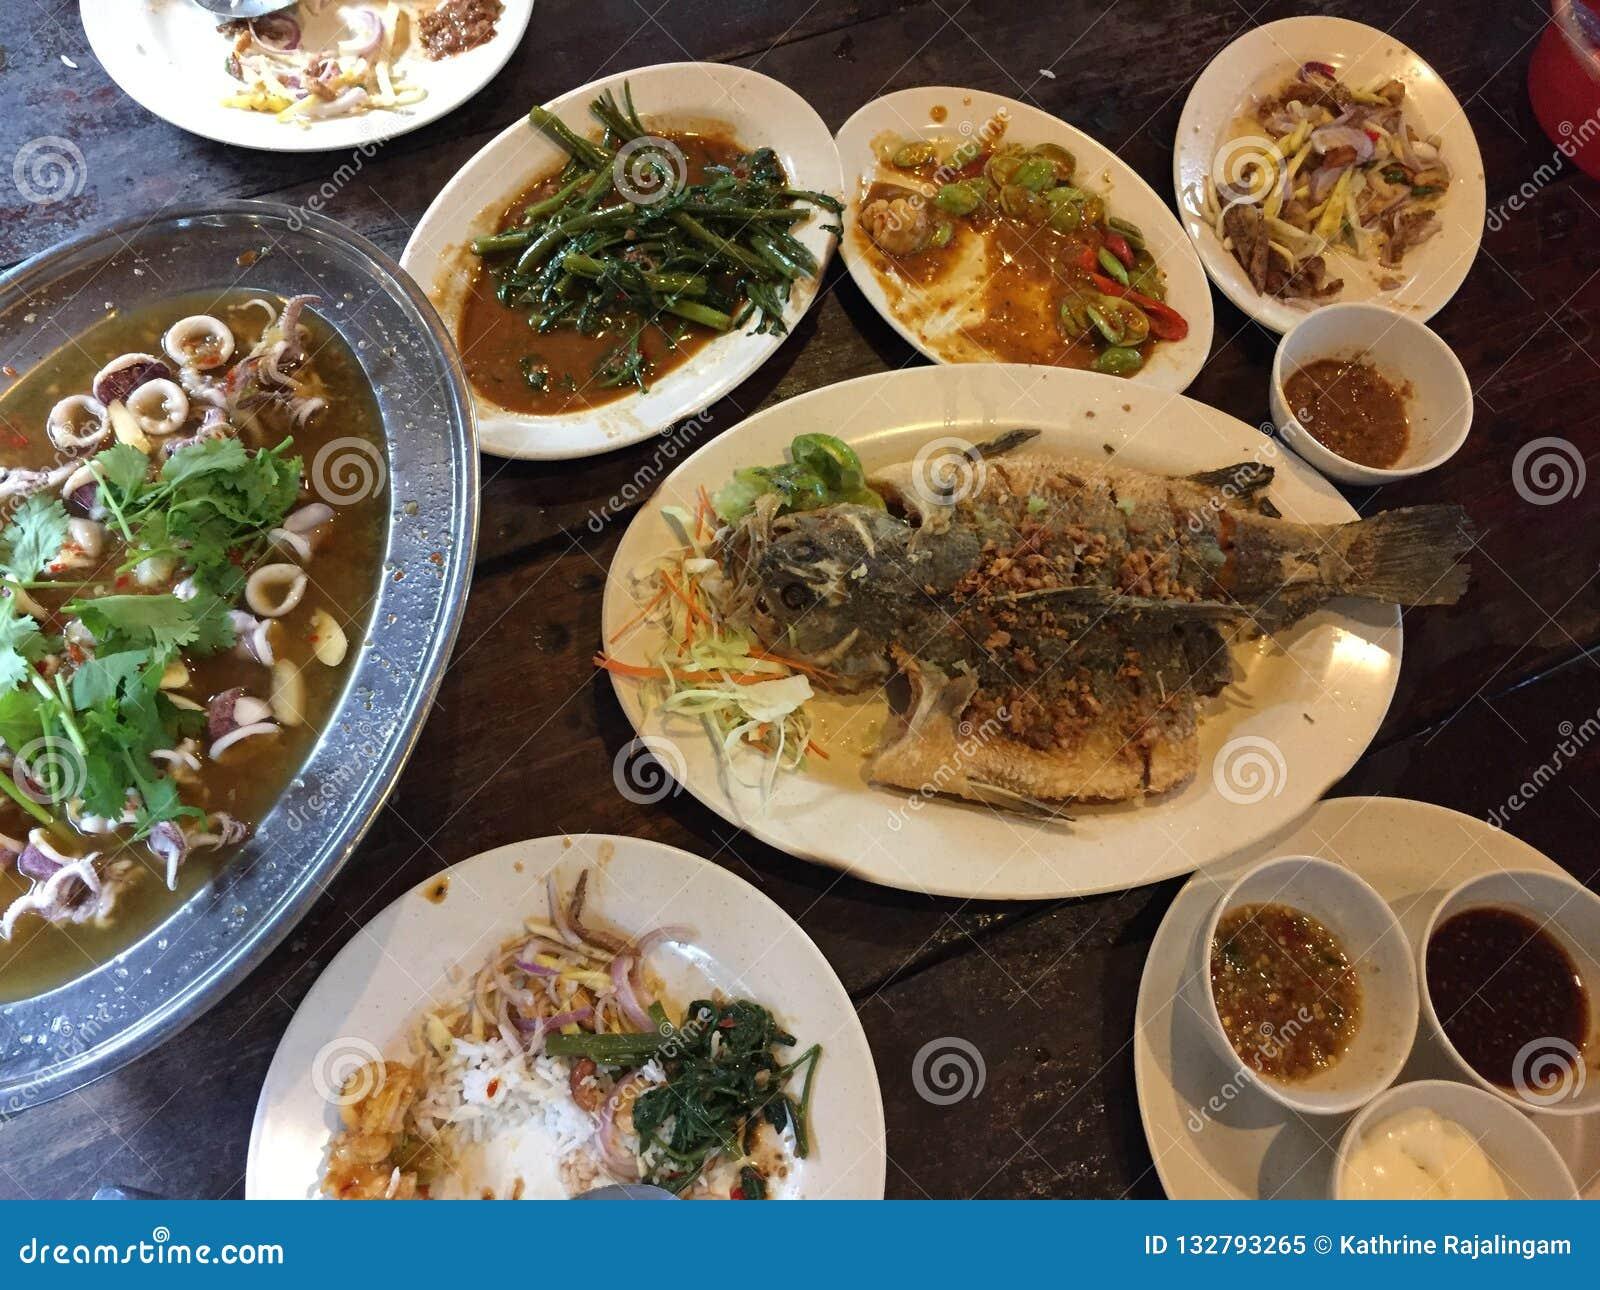 Thai meal in a restaurant